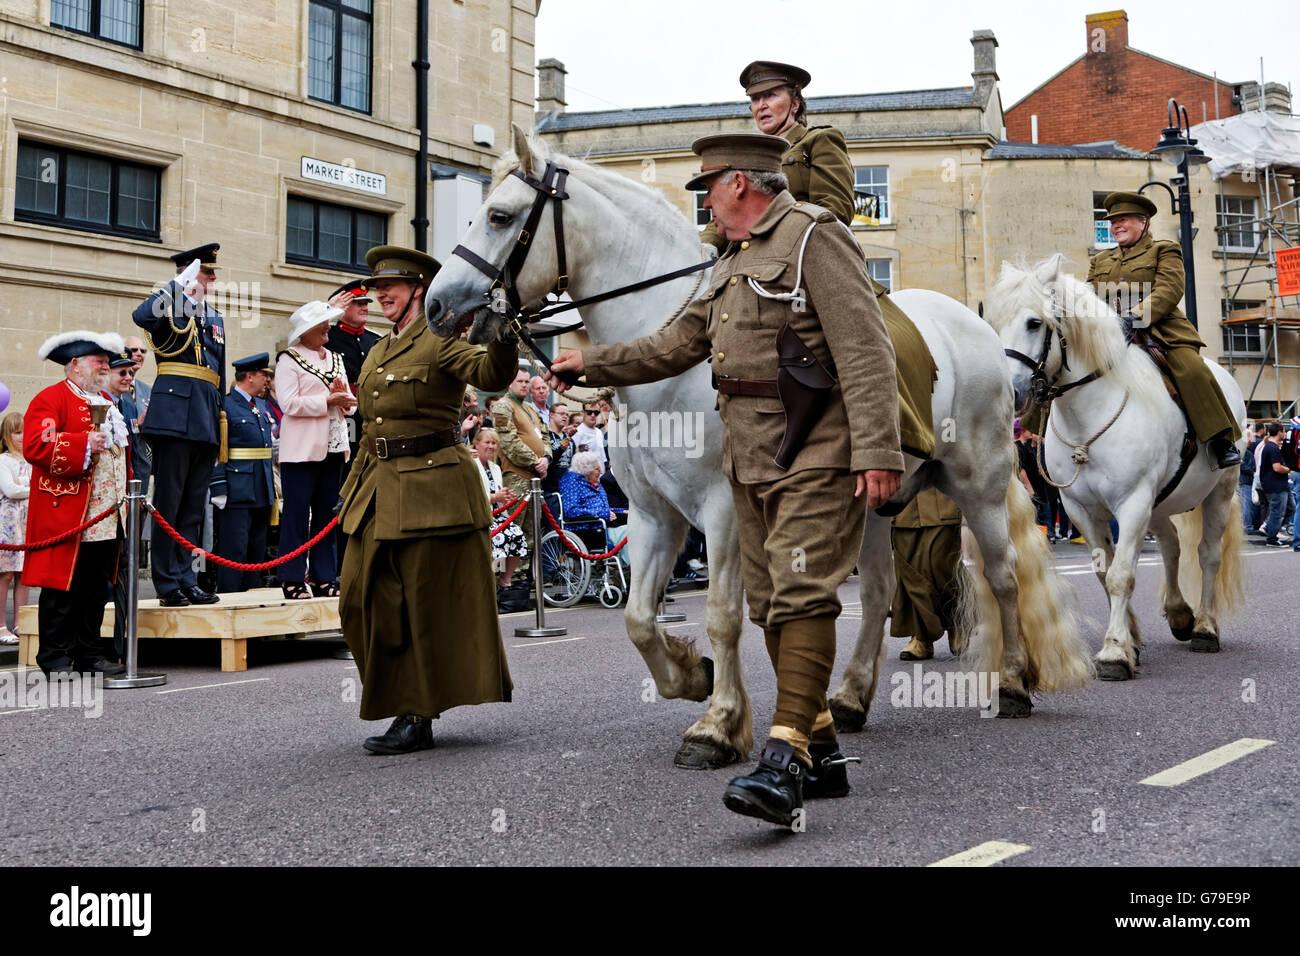 Trowbridge, Wiltshire, UK. 26th June 2016. Wiltshire Armed Forces & Veterans Celebrations at Trowbridge Town - Stock Image